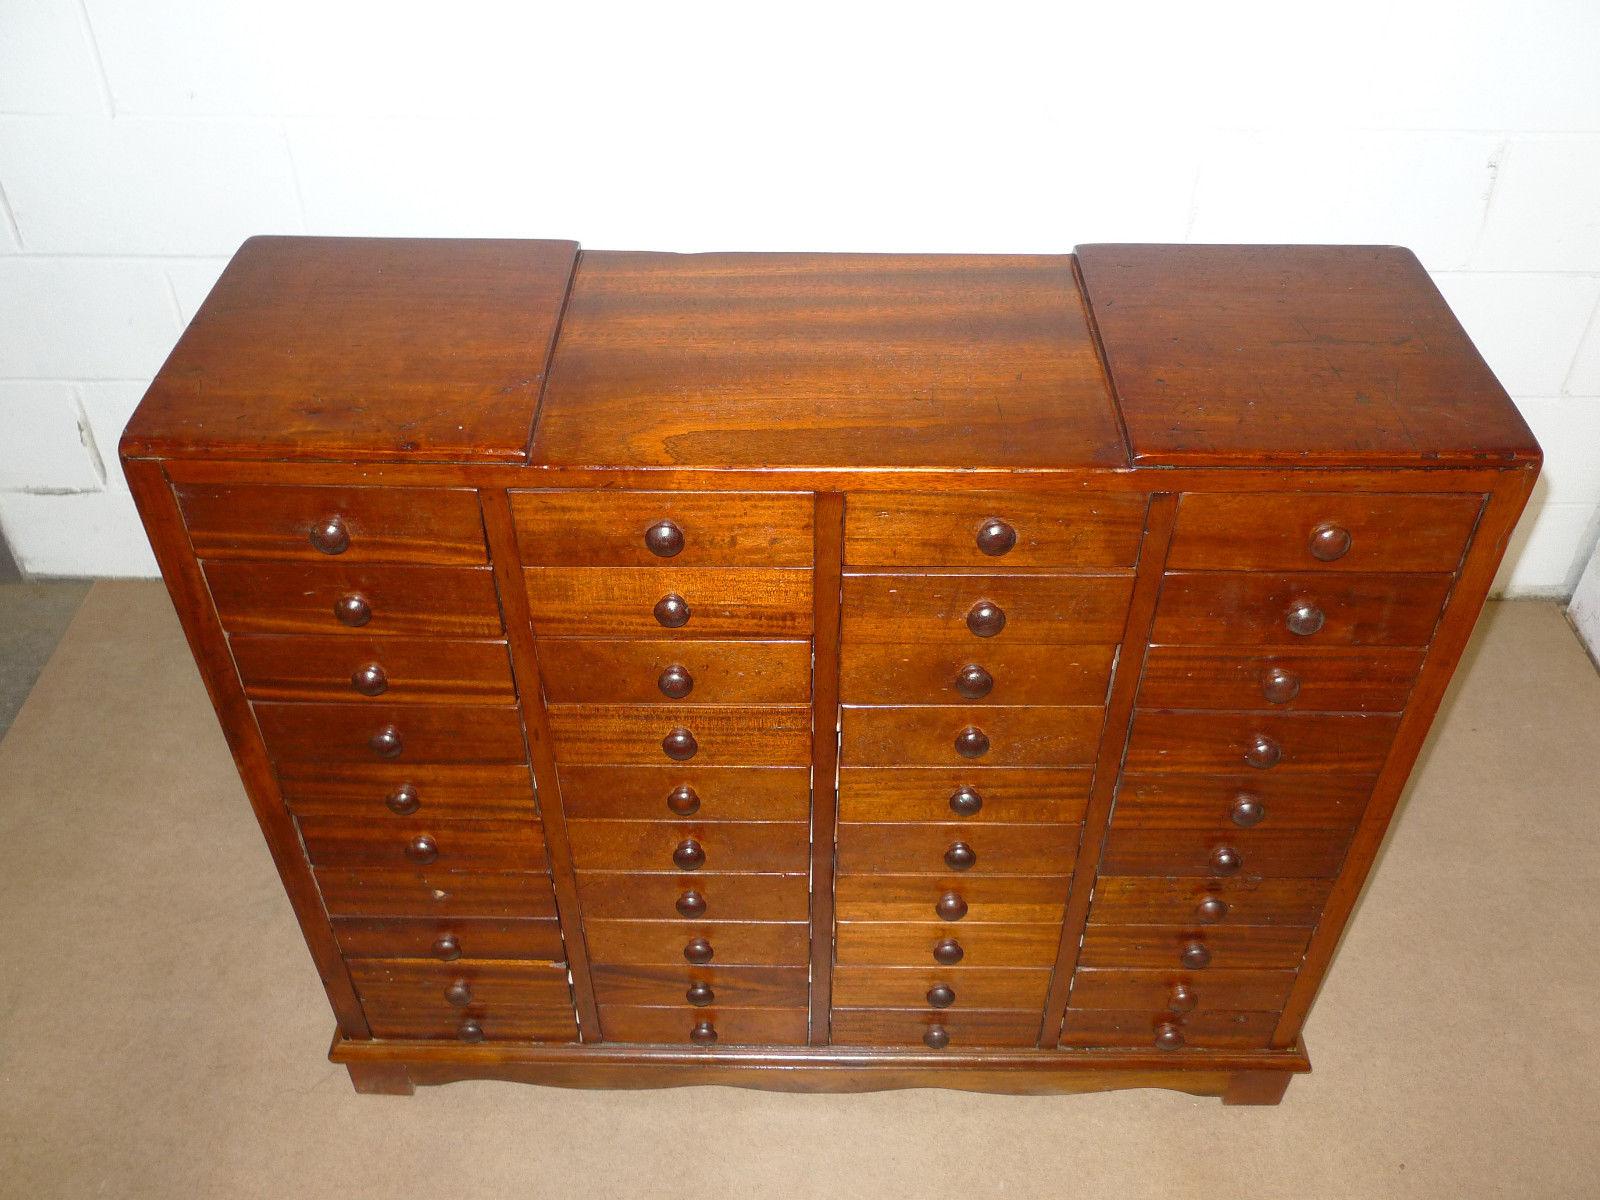 AmerMission Solid Mahogany Apothecary Cabinet 1800 1899 Antique AmerMission Solid Mahogany